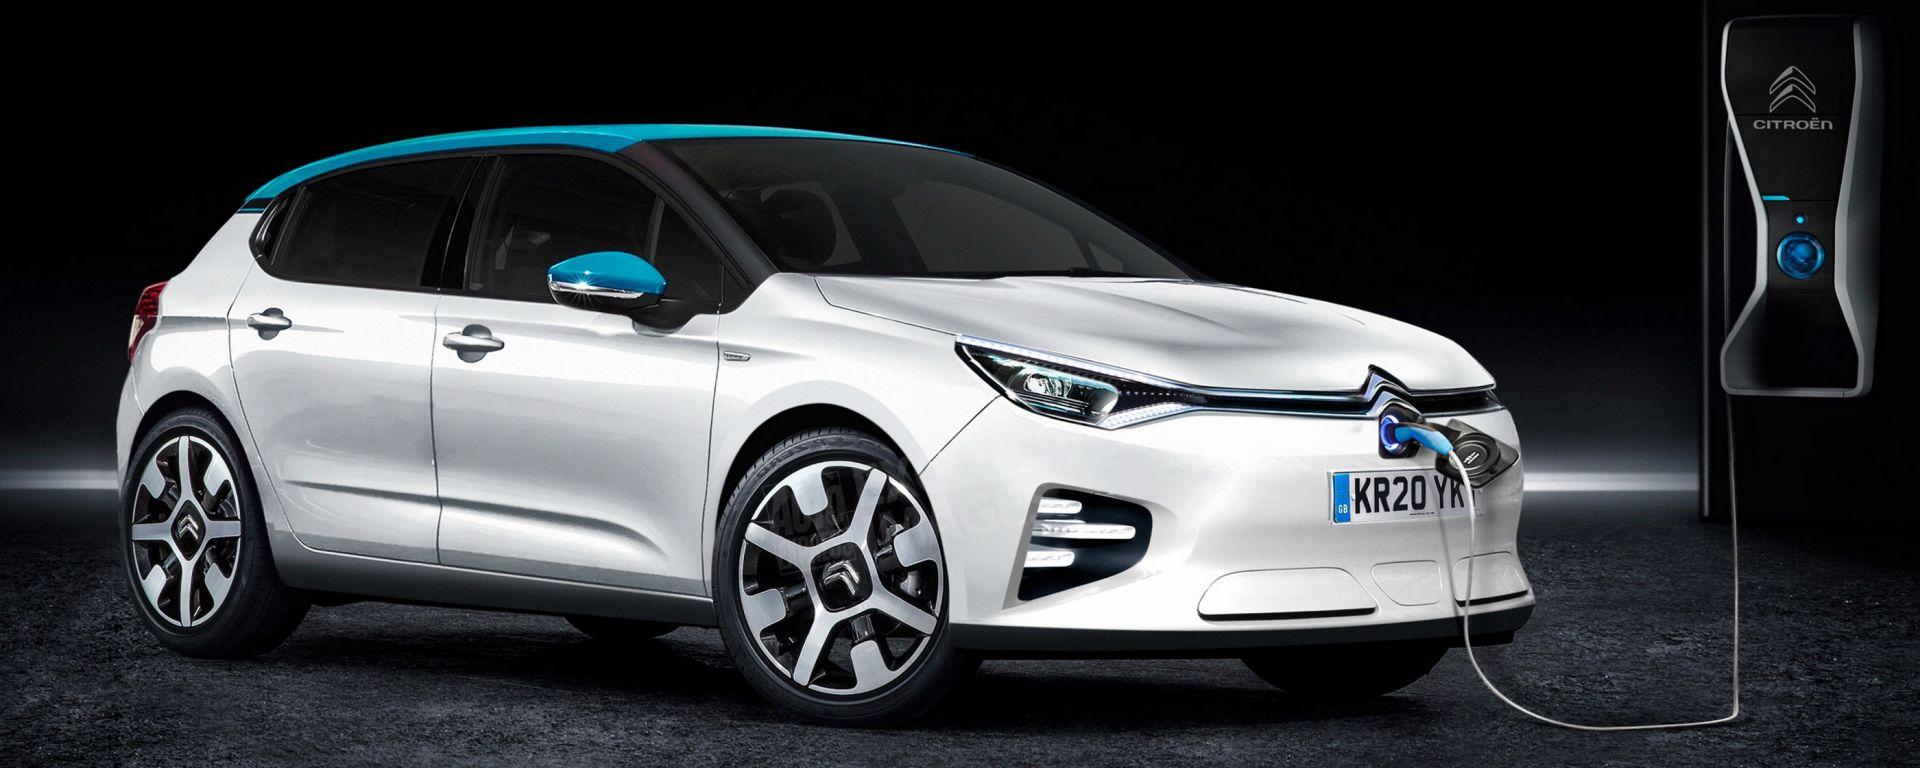 Citroen C4 electric 2020